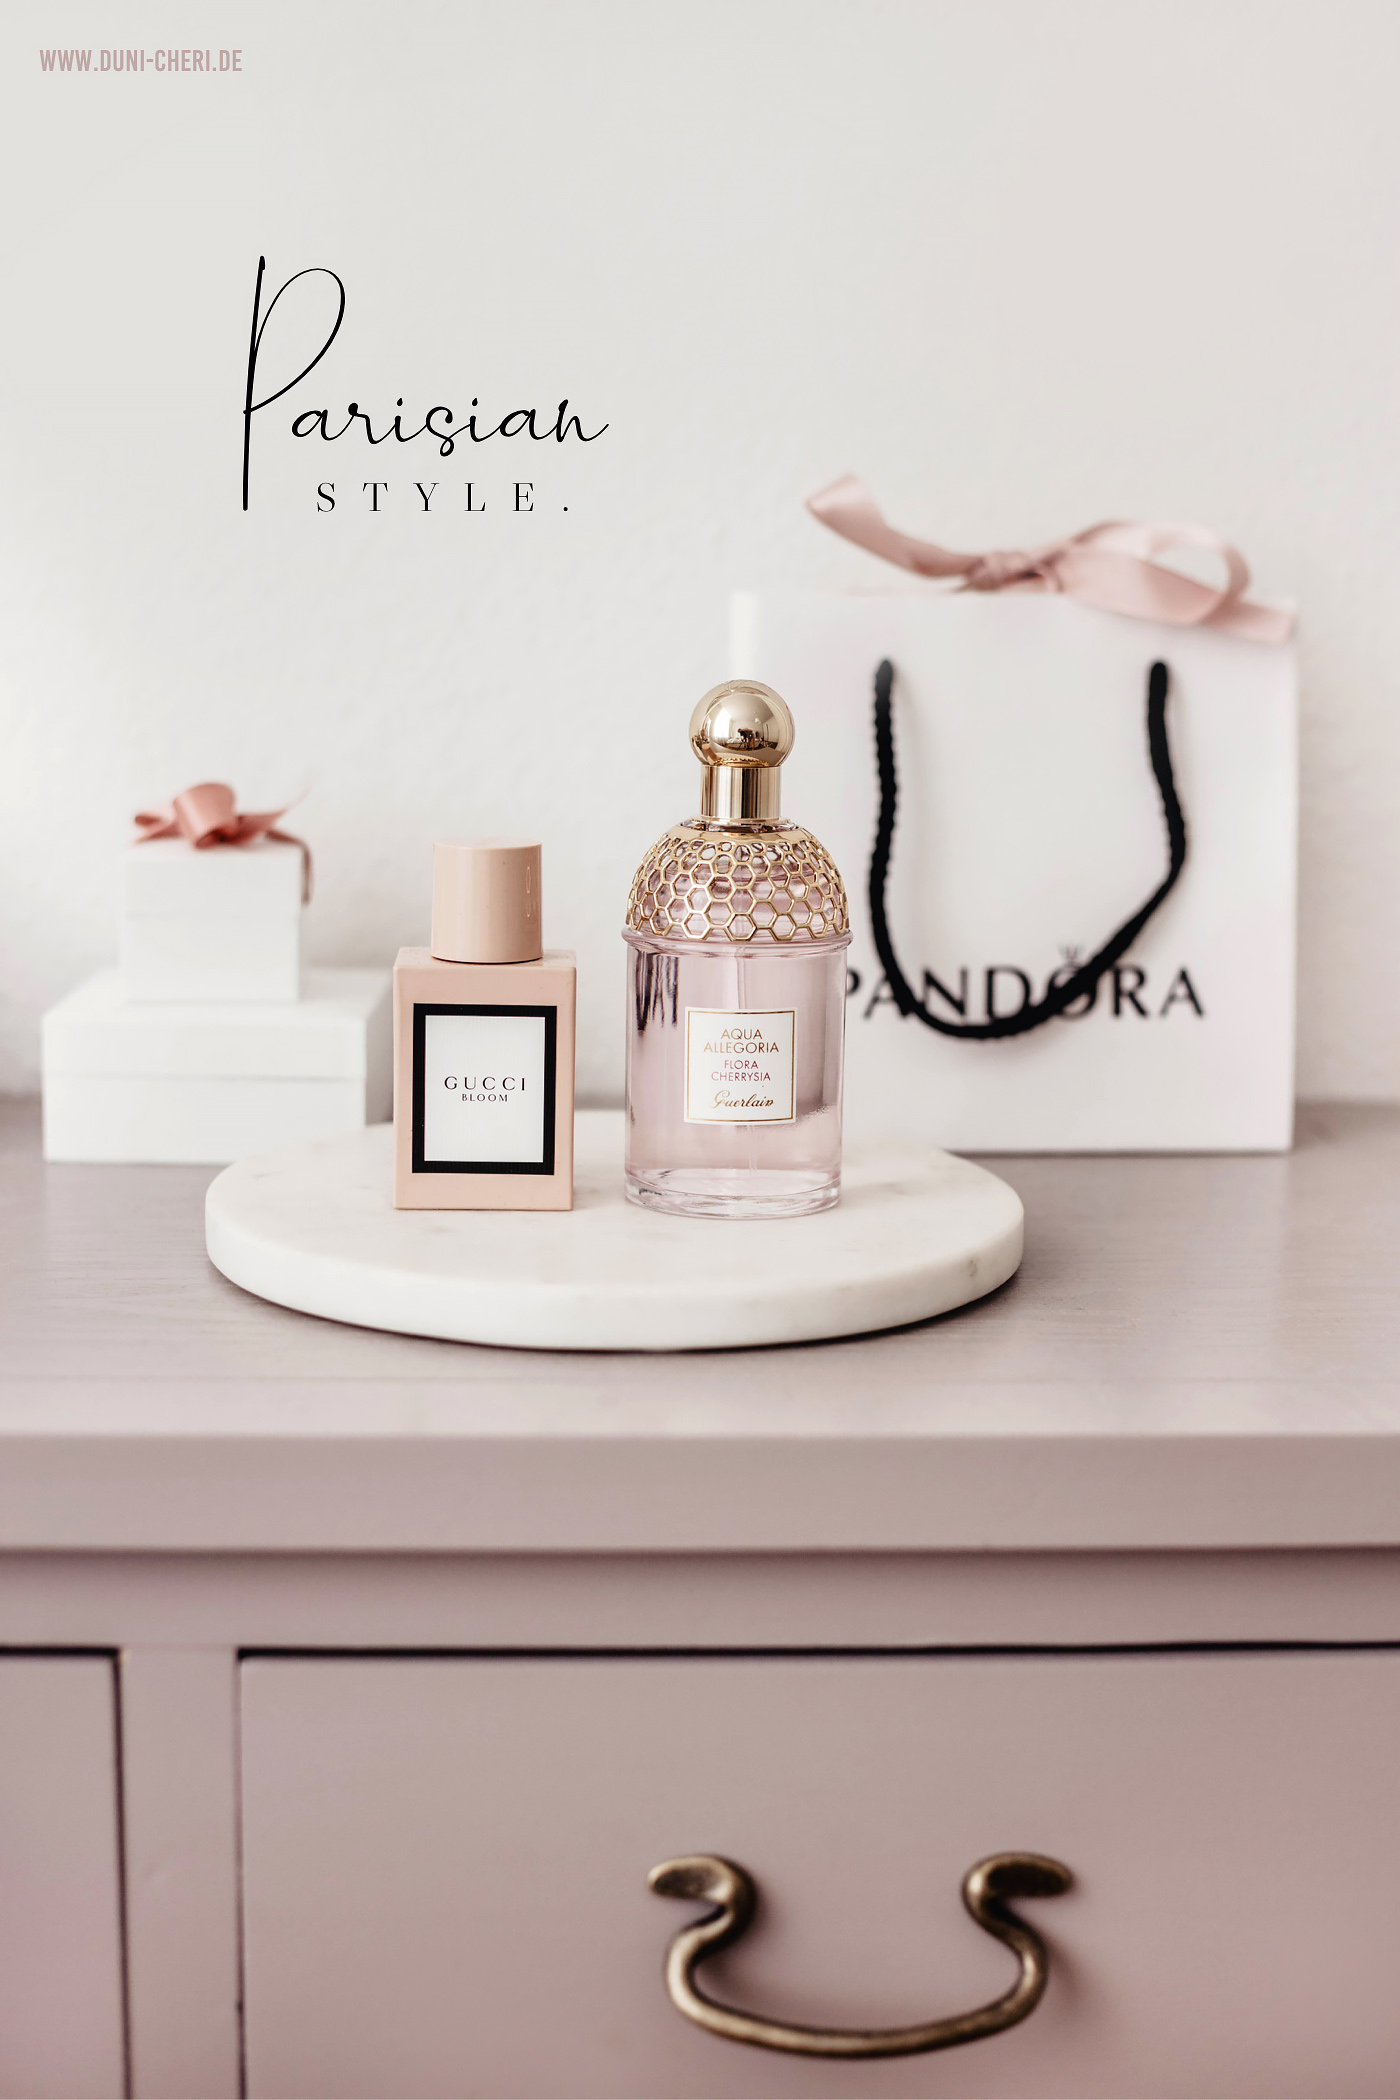 gucci guerlain parfum parisian interior